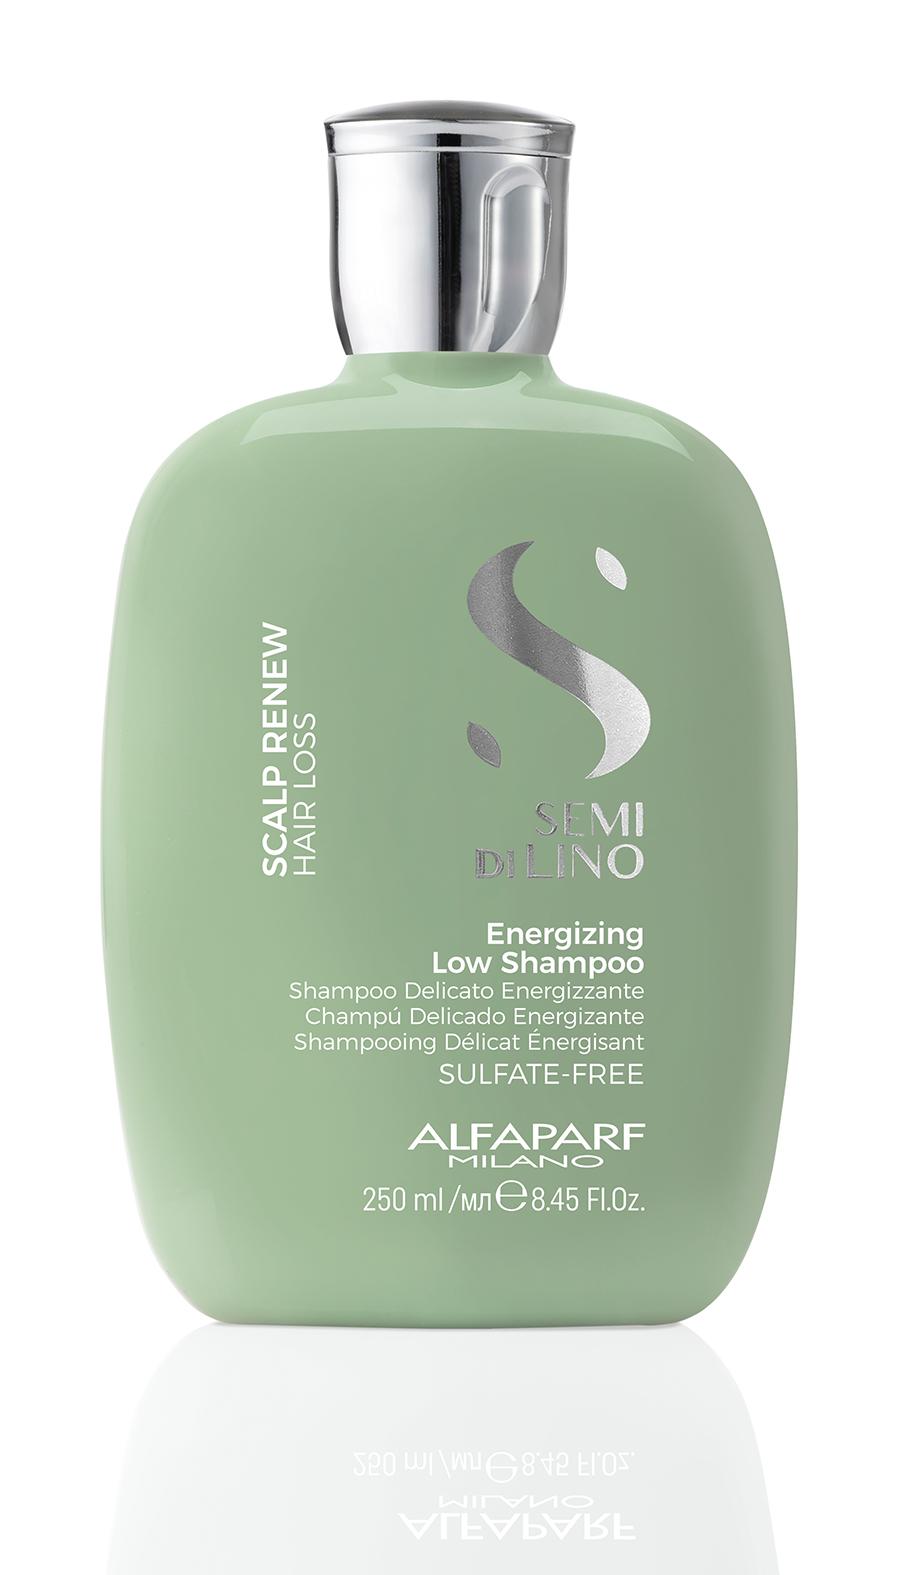 semi-di-lino-scalp-energizing-low-shampoo-pf019466-fla-250ml-nolev.jpg